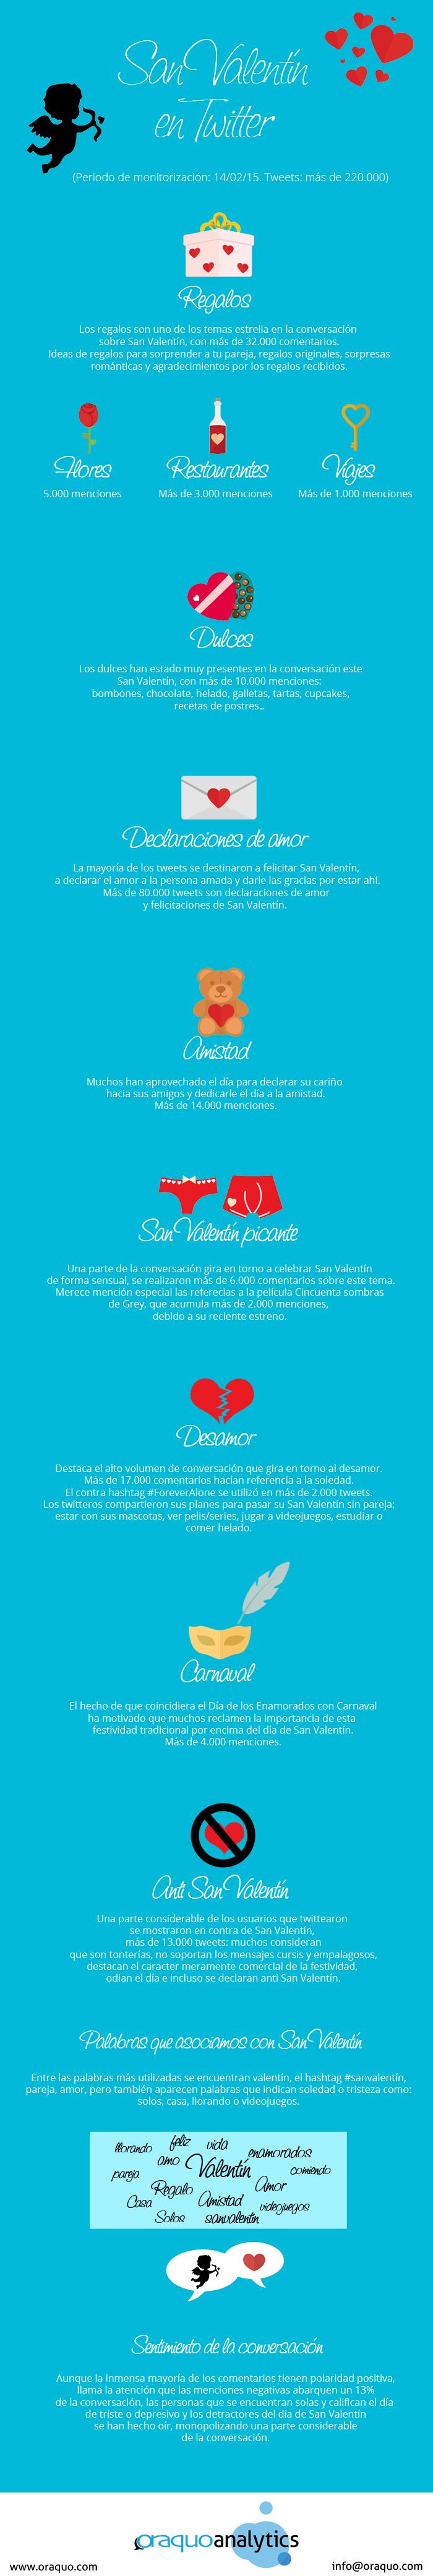 San Valentín en Twitter